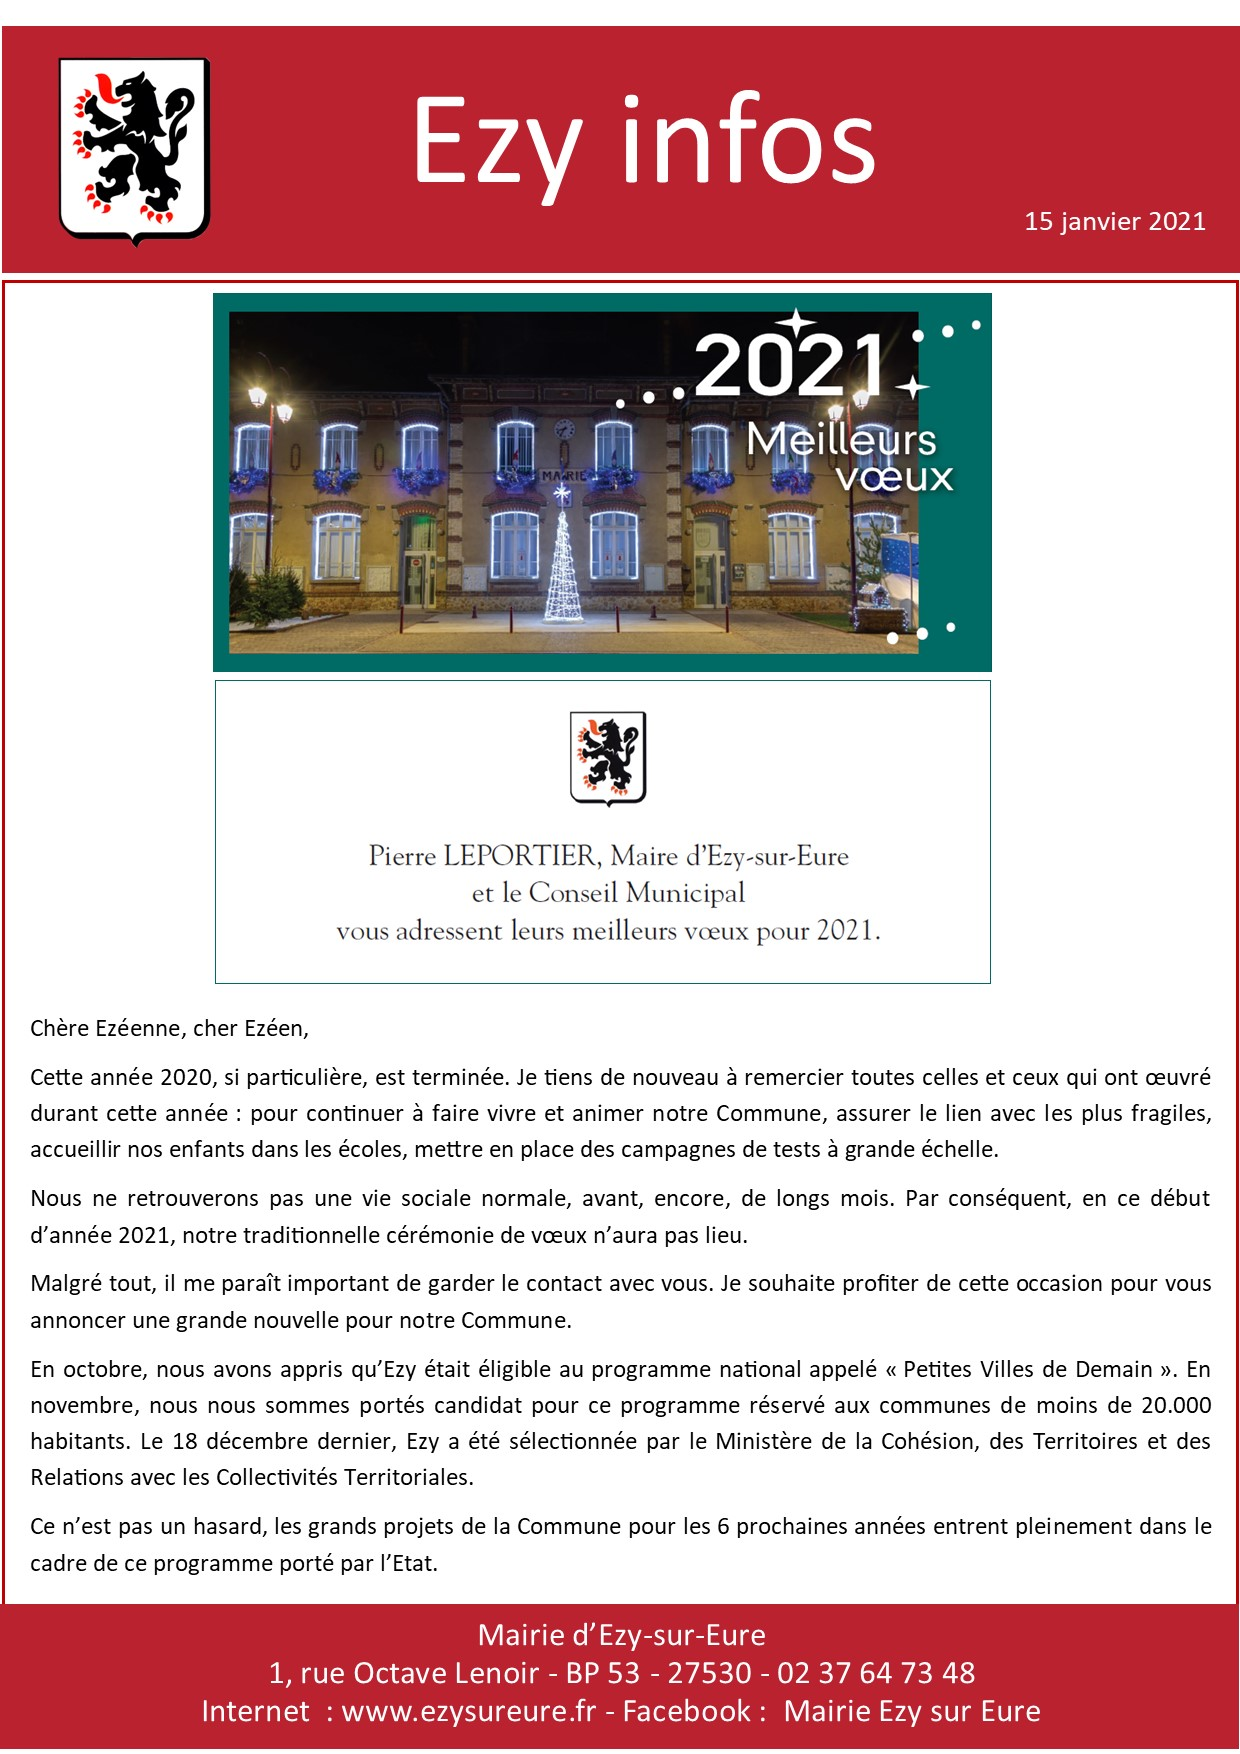 Ezy infos - Voeux 2021 P1.jpg